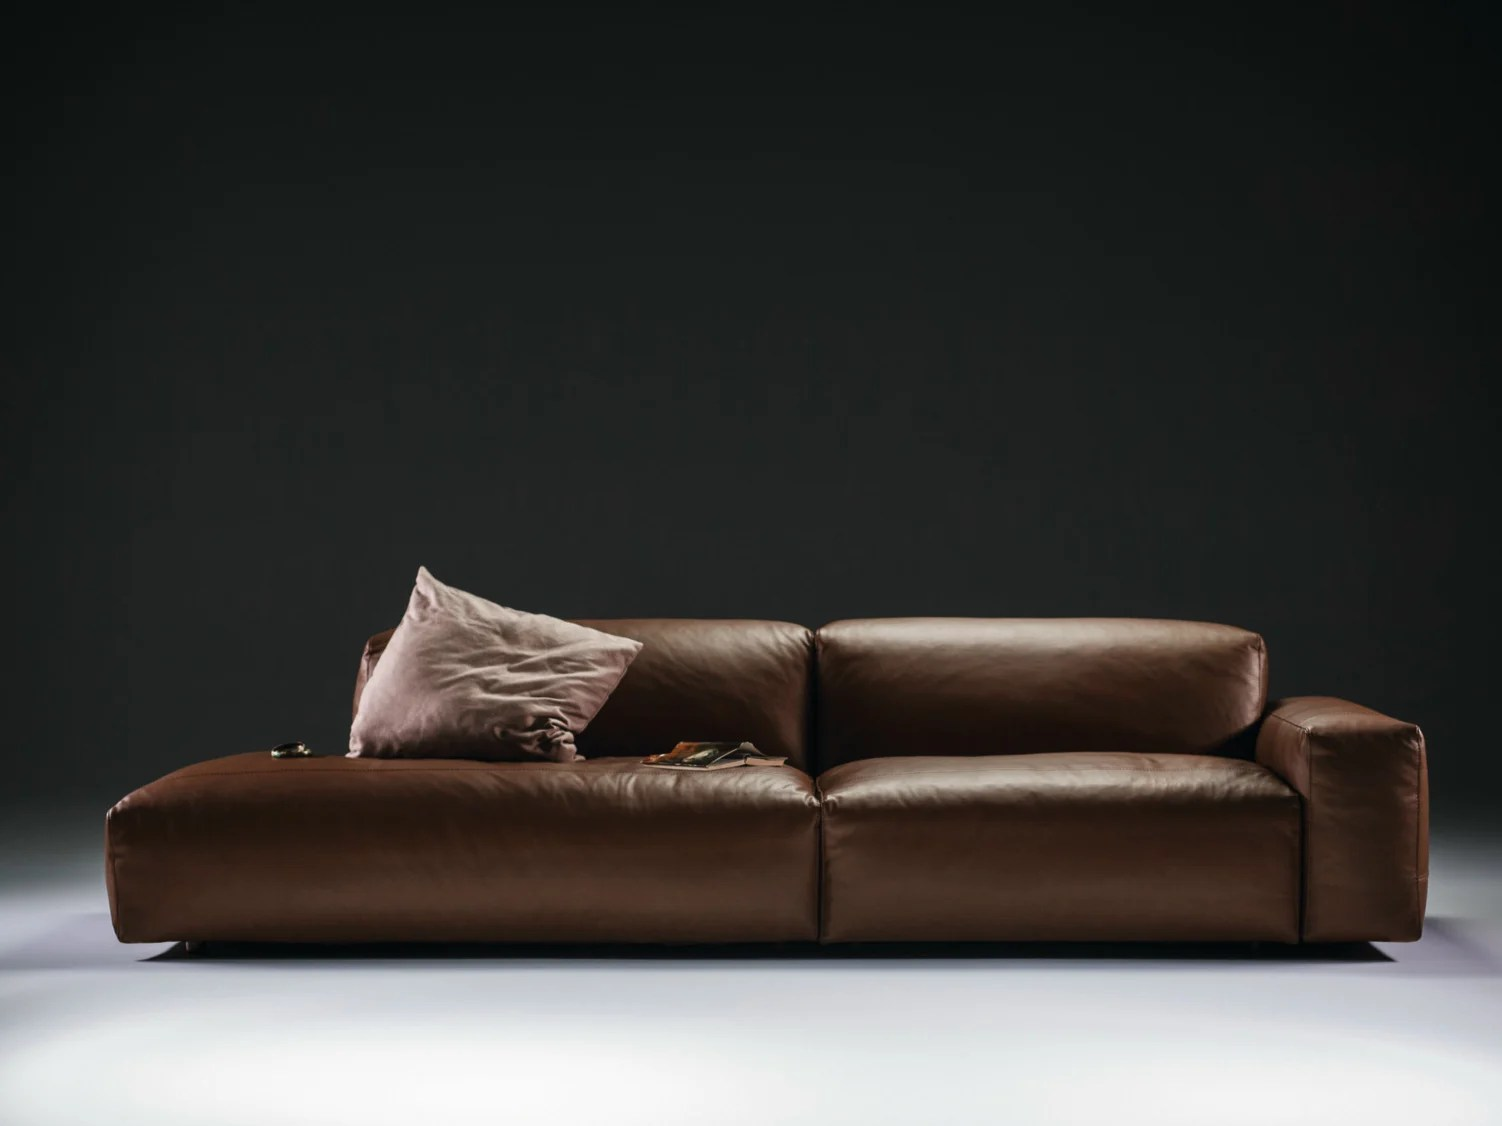 cloud 9 sofa electric recliner problems by prostoria ltd design sanja knezovic